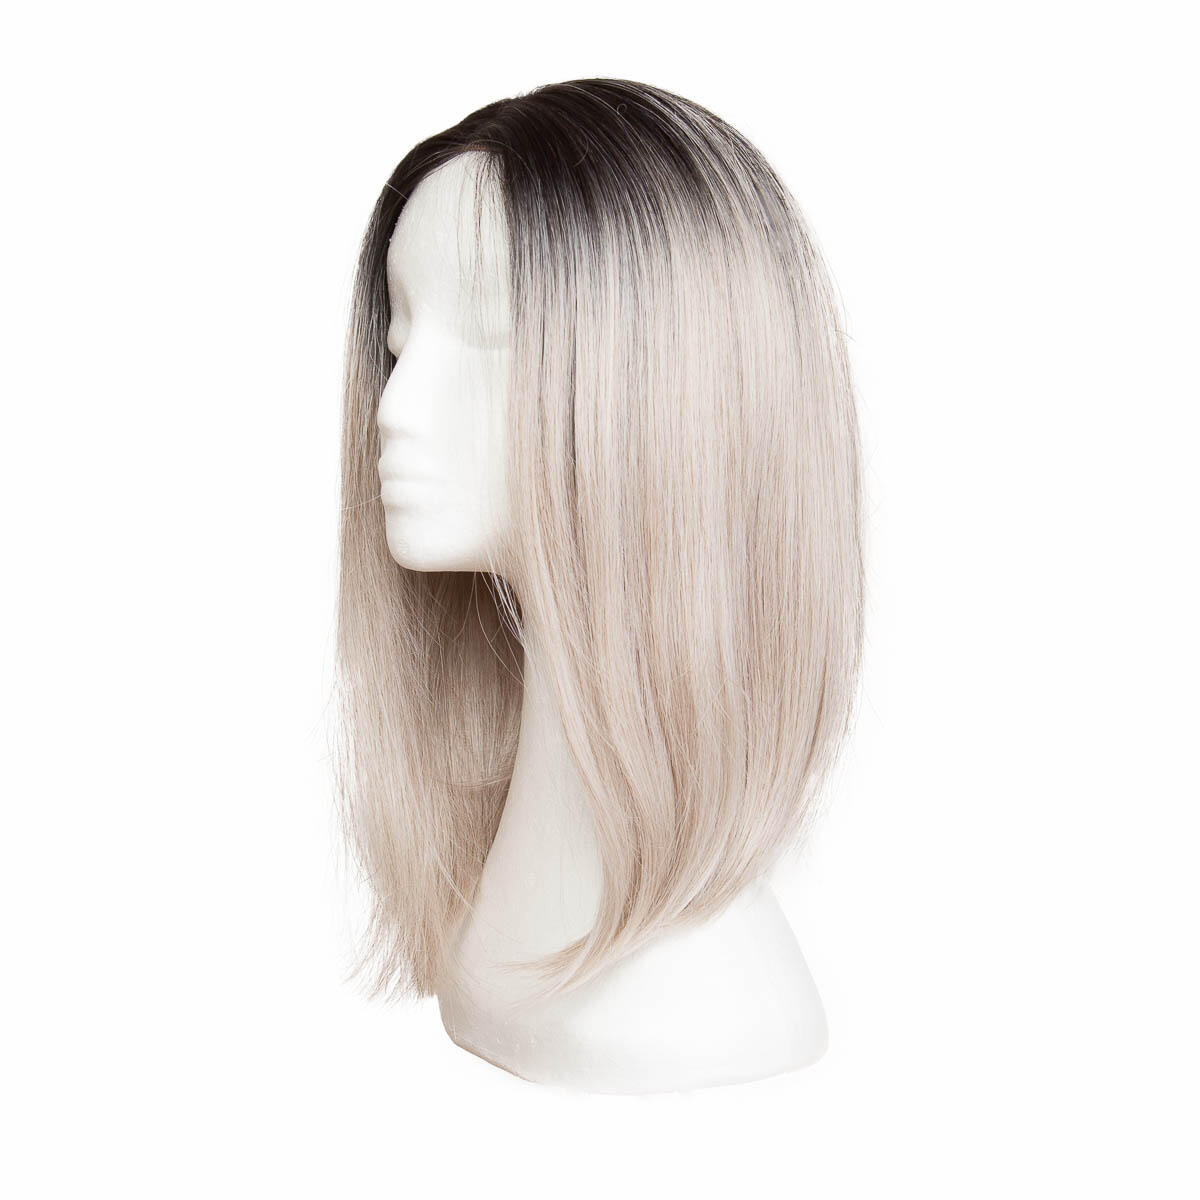 Lace Front Wig O1.2/10.5 Black Brown/Grey 40 cm